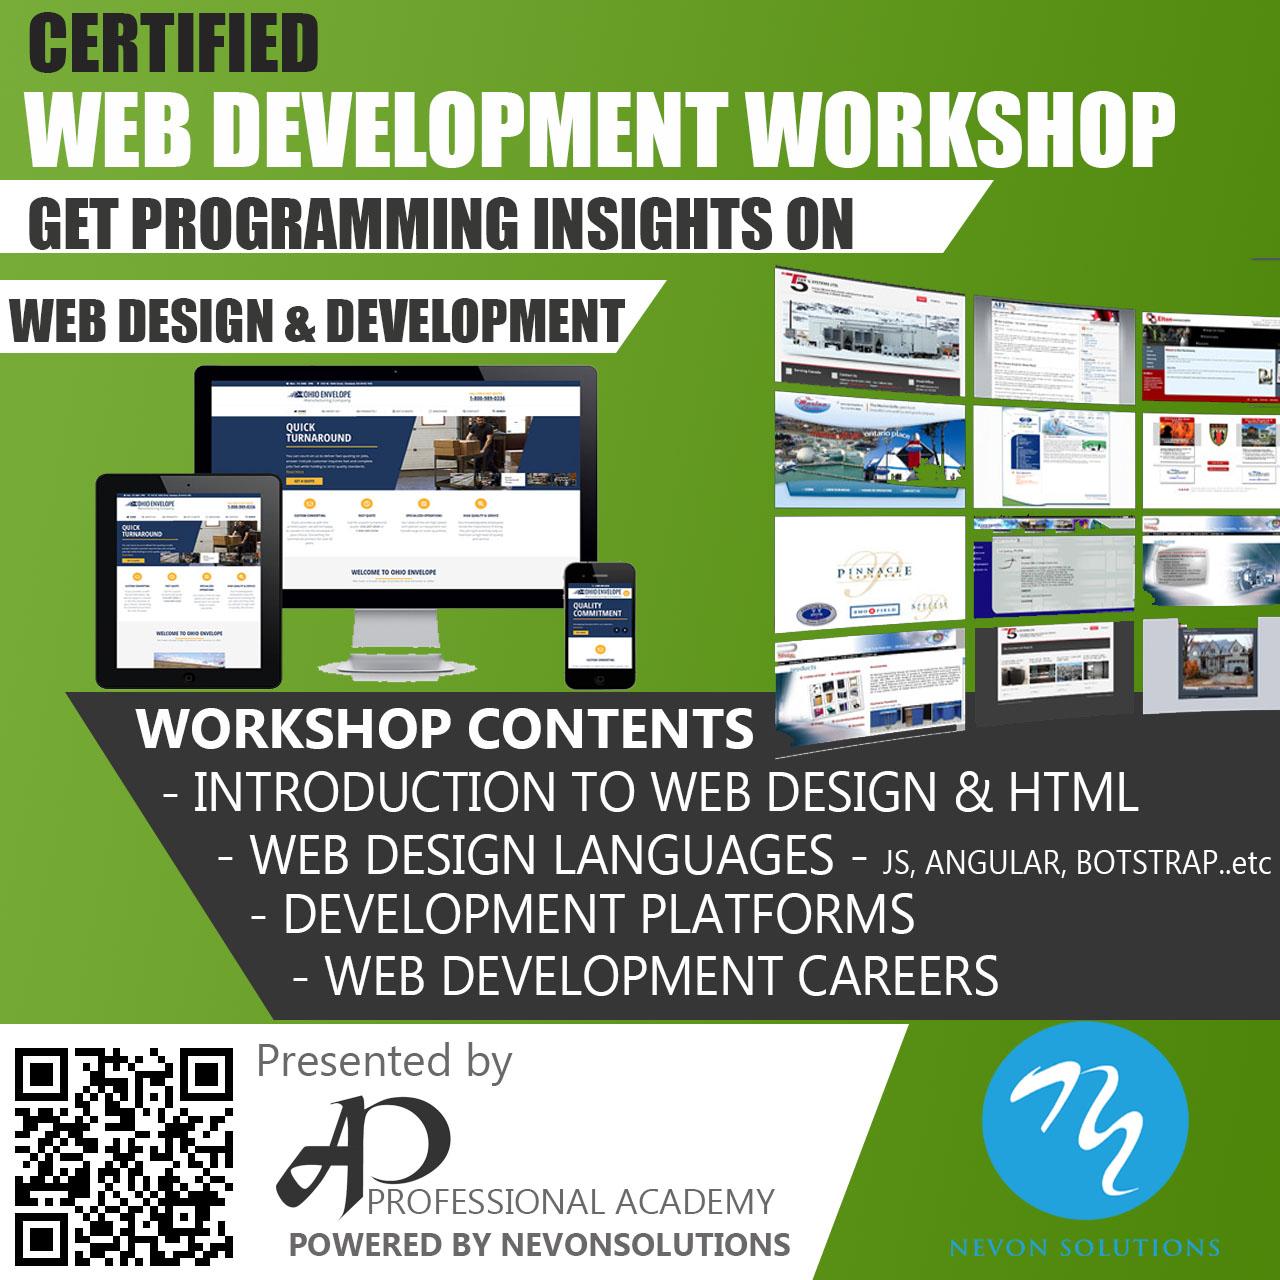 nevon Web development workshop